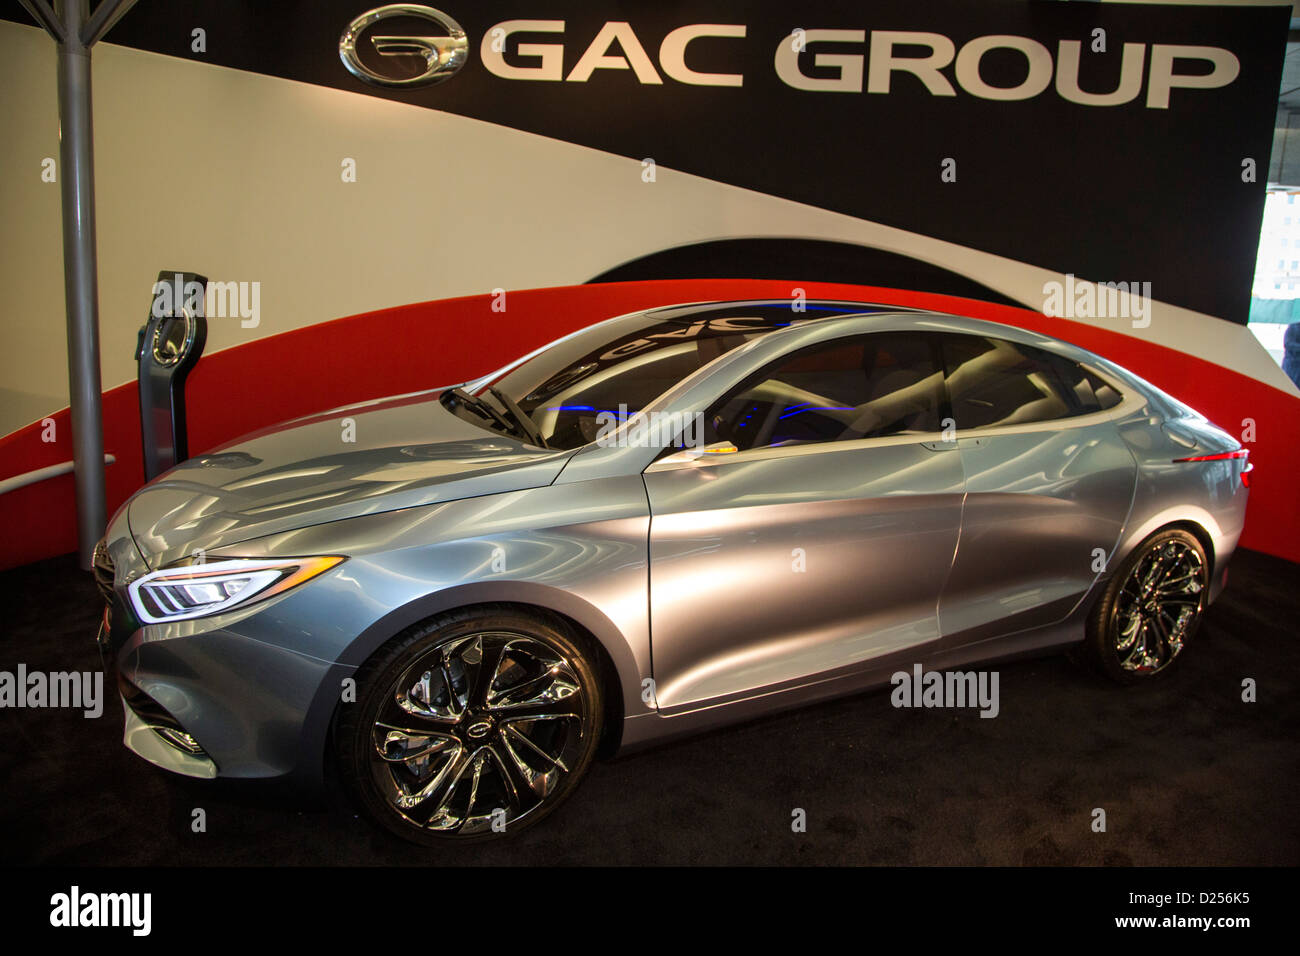 El Guangzhou Automobile Group's E-jet coche eléctrico de autonomía extendida en la exhibición Imagen De Stock